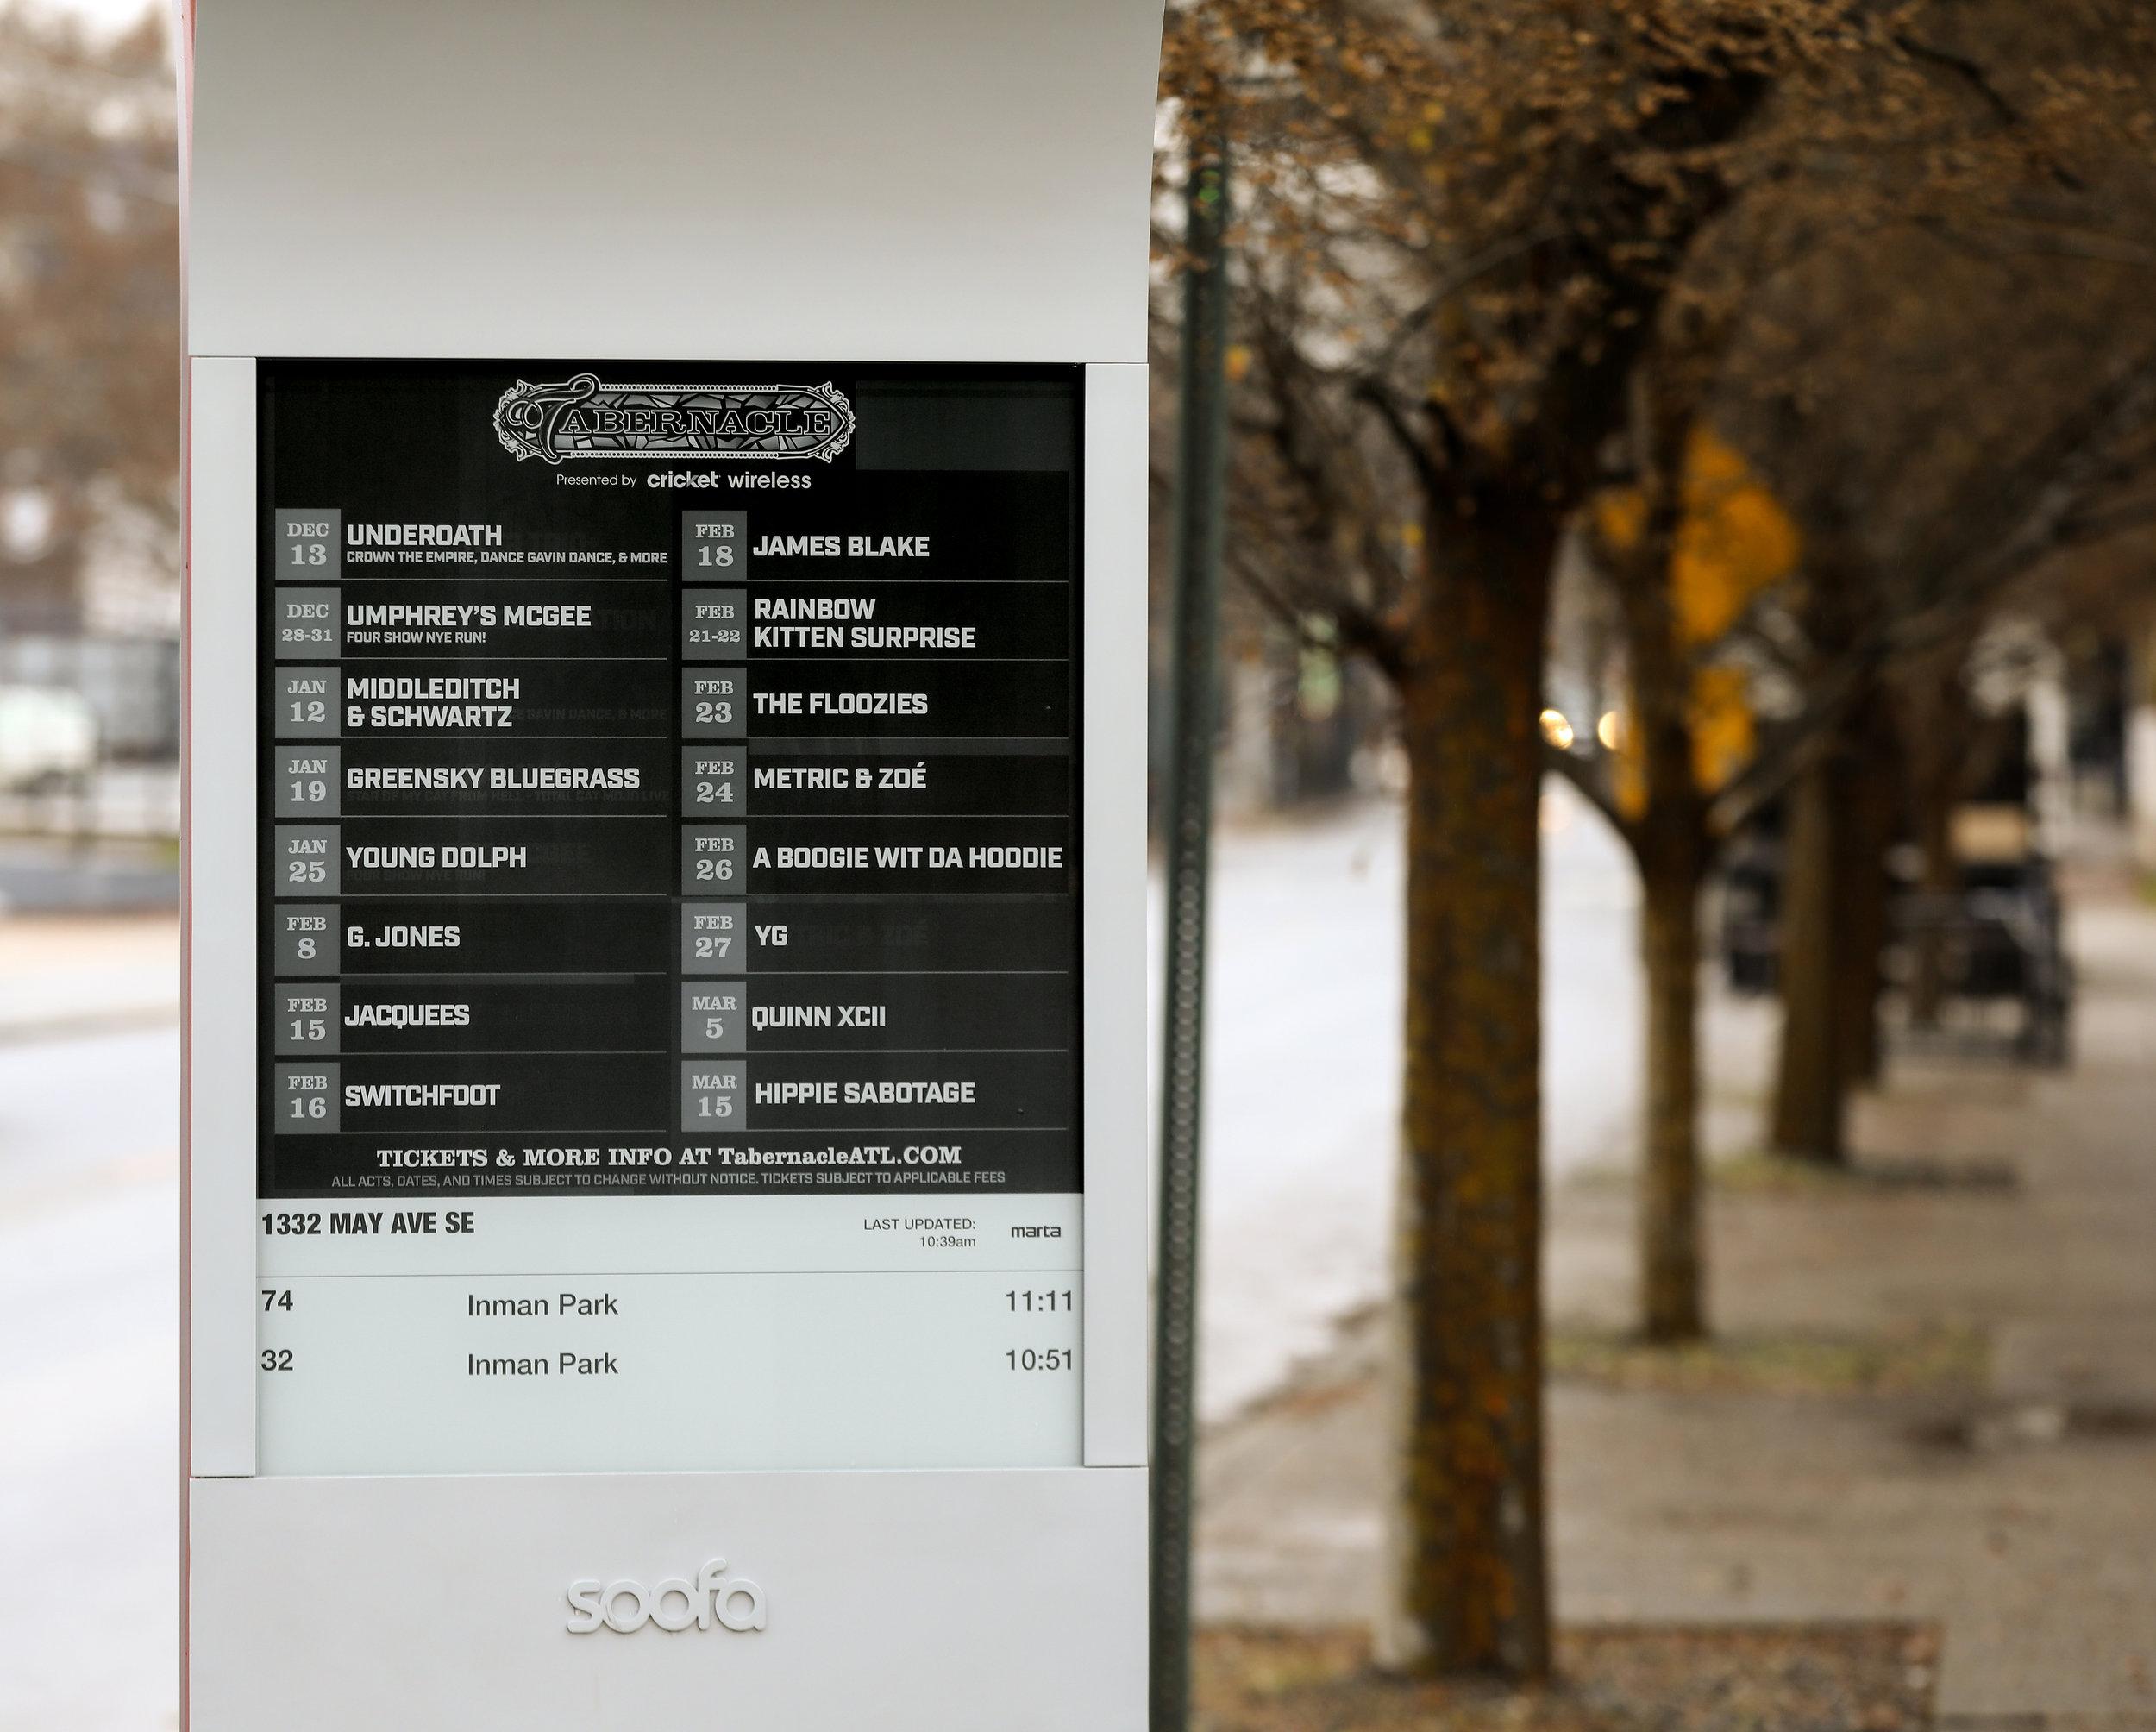 Live Nation uses high contrast design to display their Atlanta concert calendar.